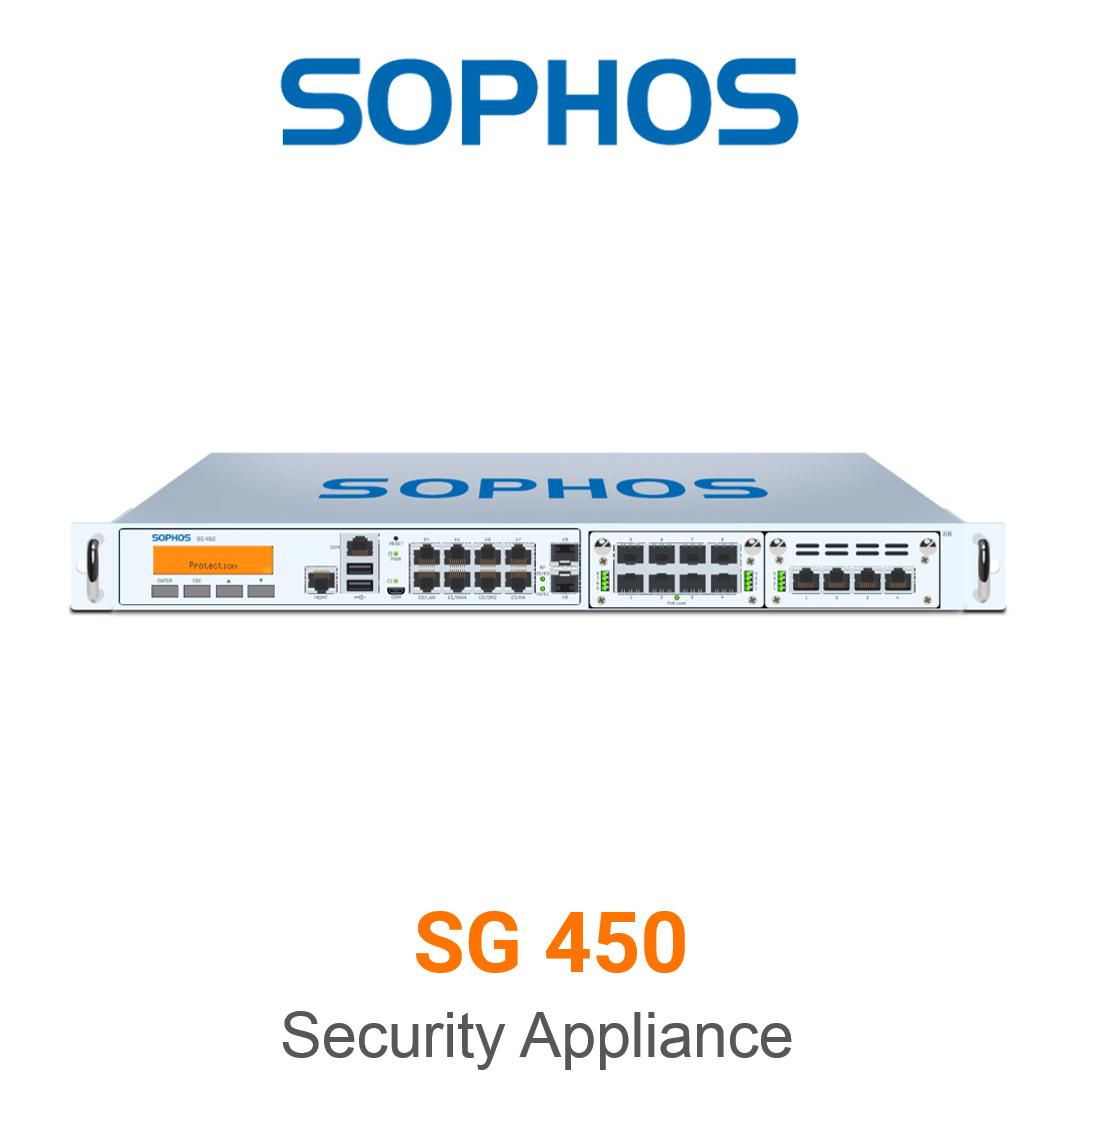 Sophos SG 450 Securiy Appliance